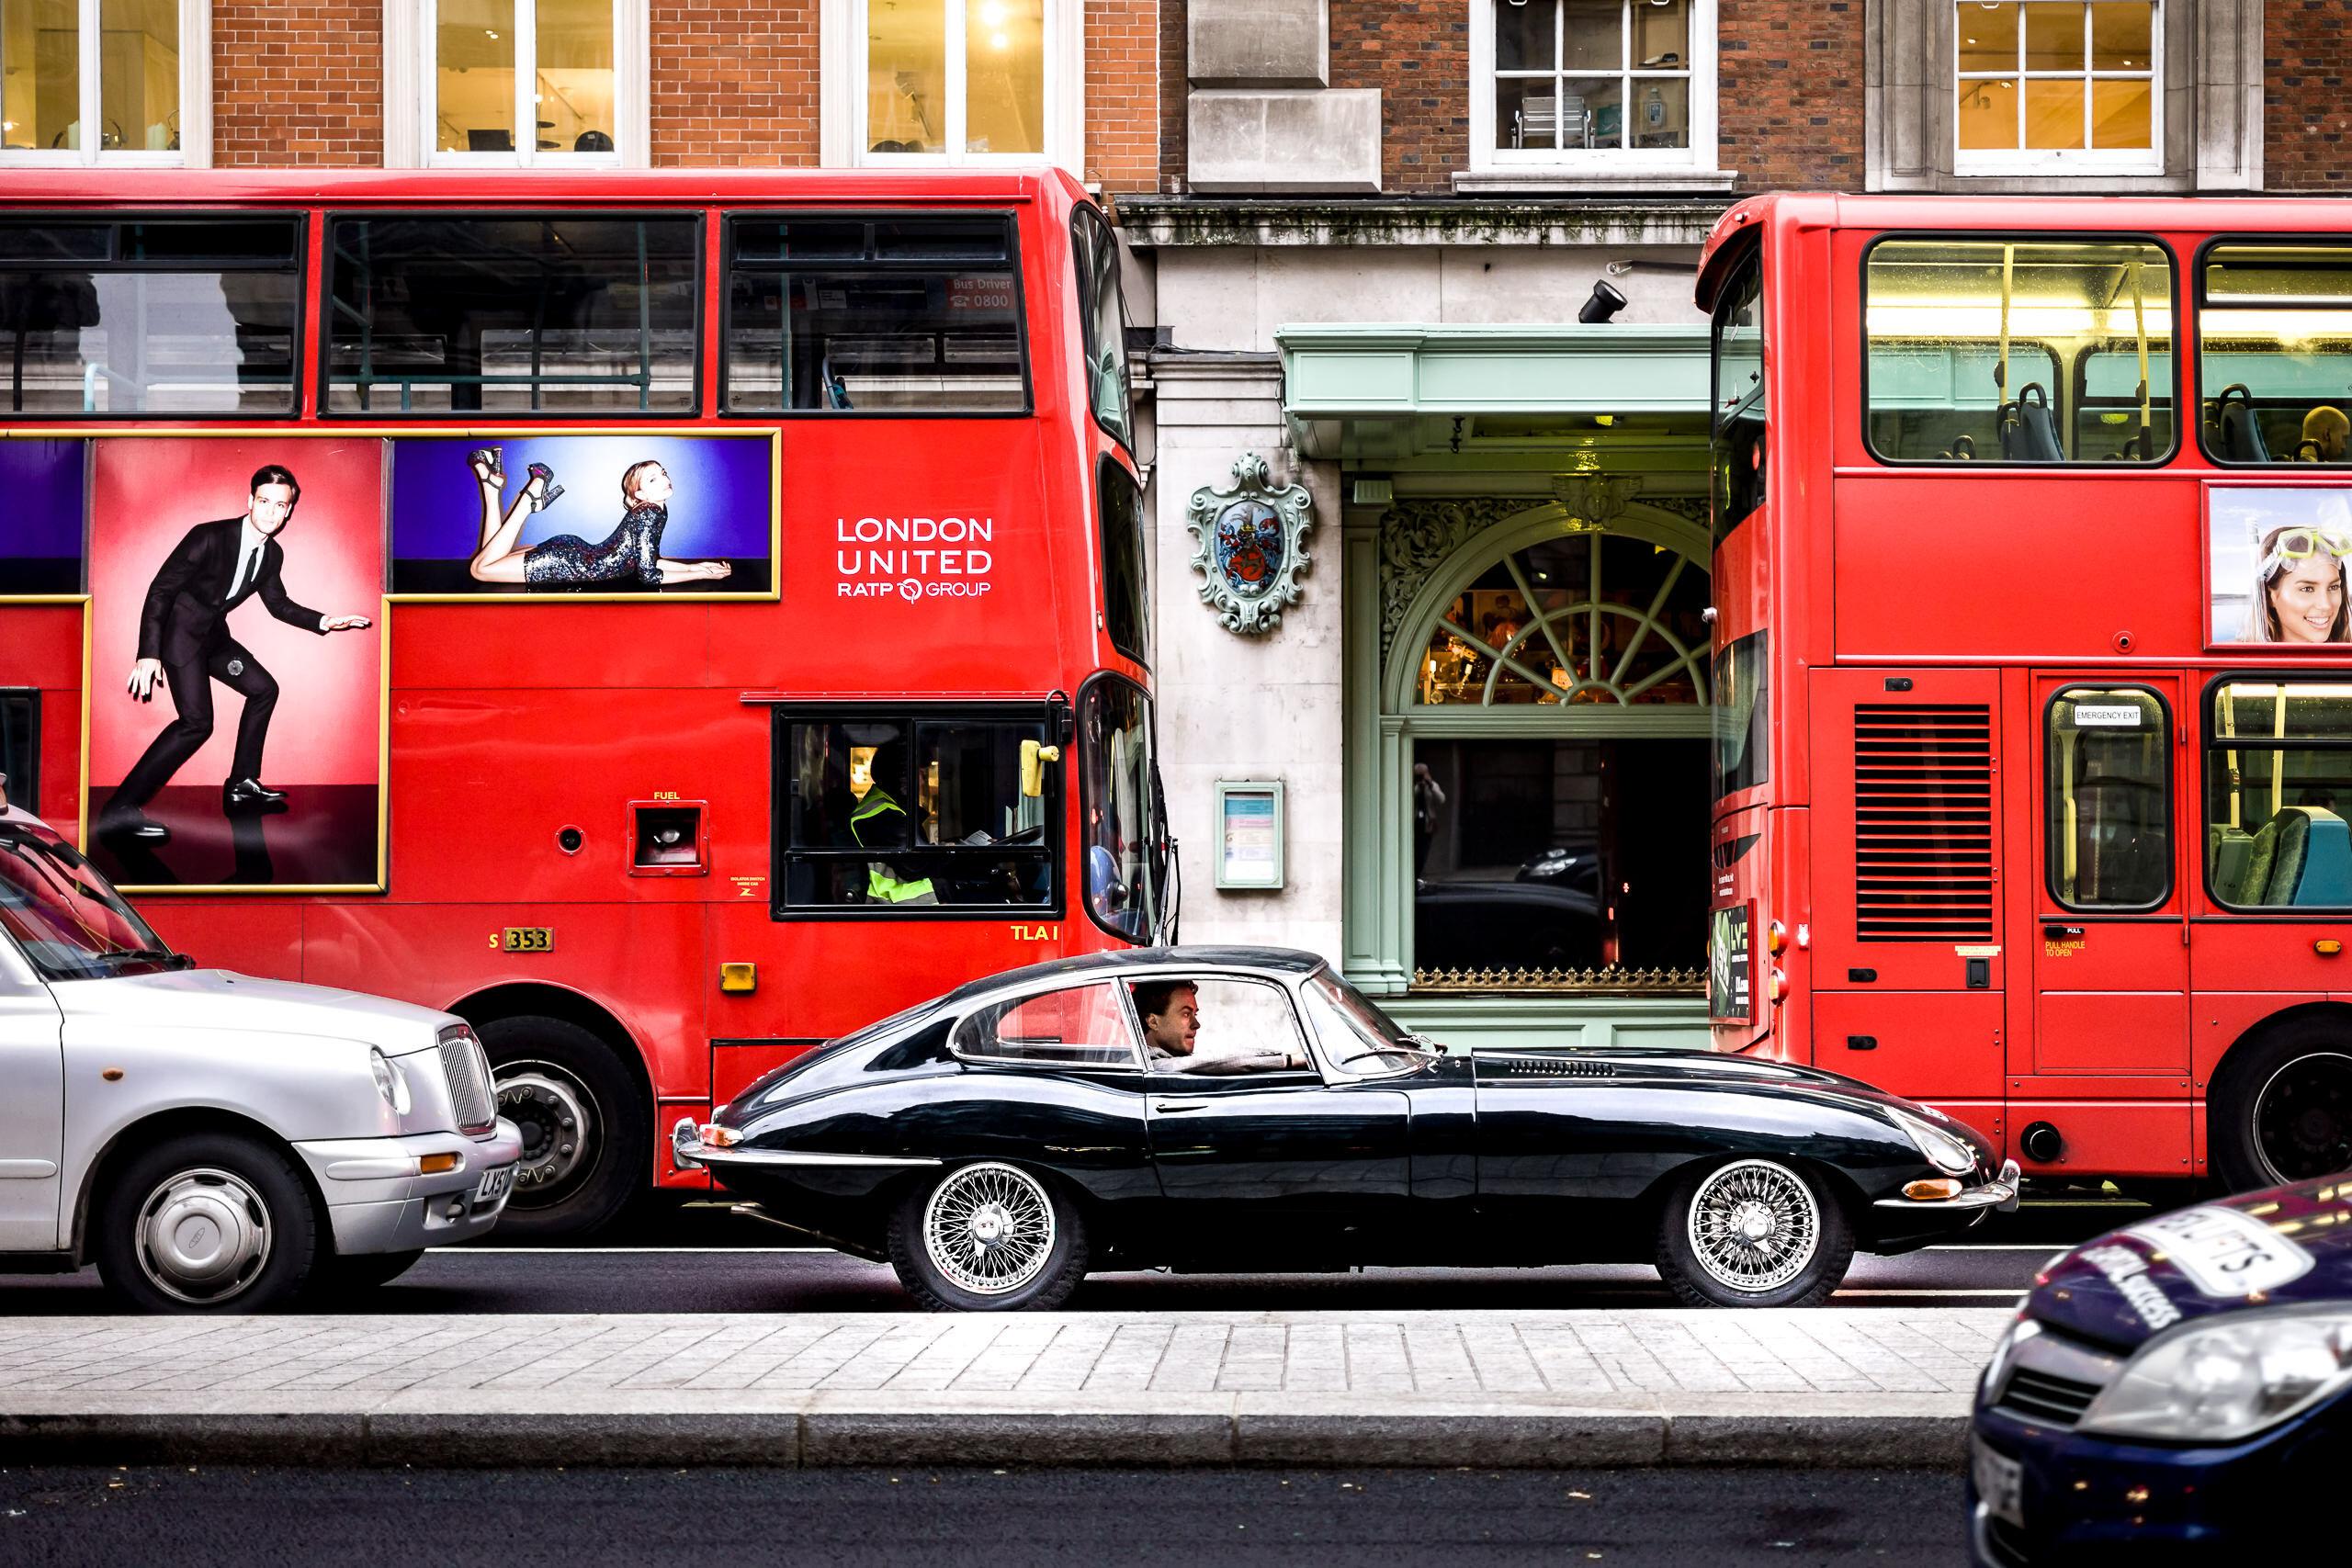 Workshop Gallery About Street Jaguar E Type London By Brett Leica Photographer